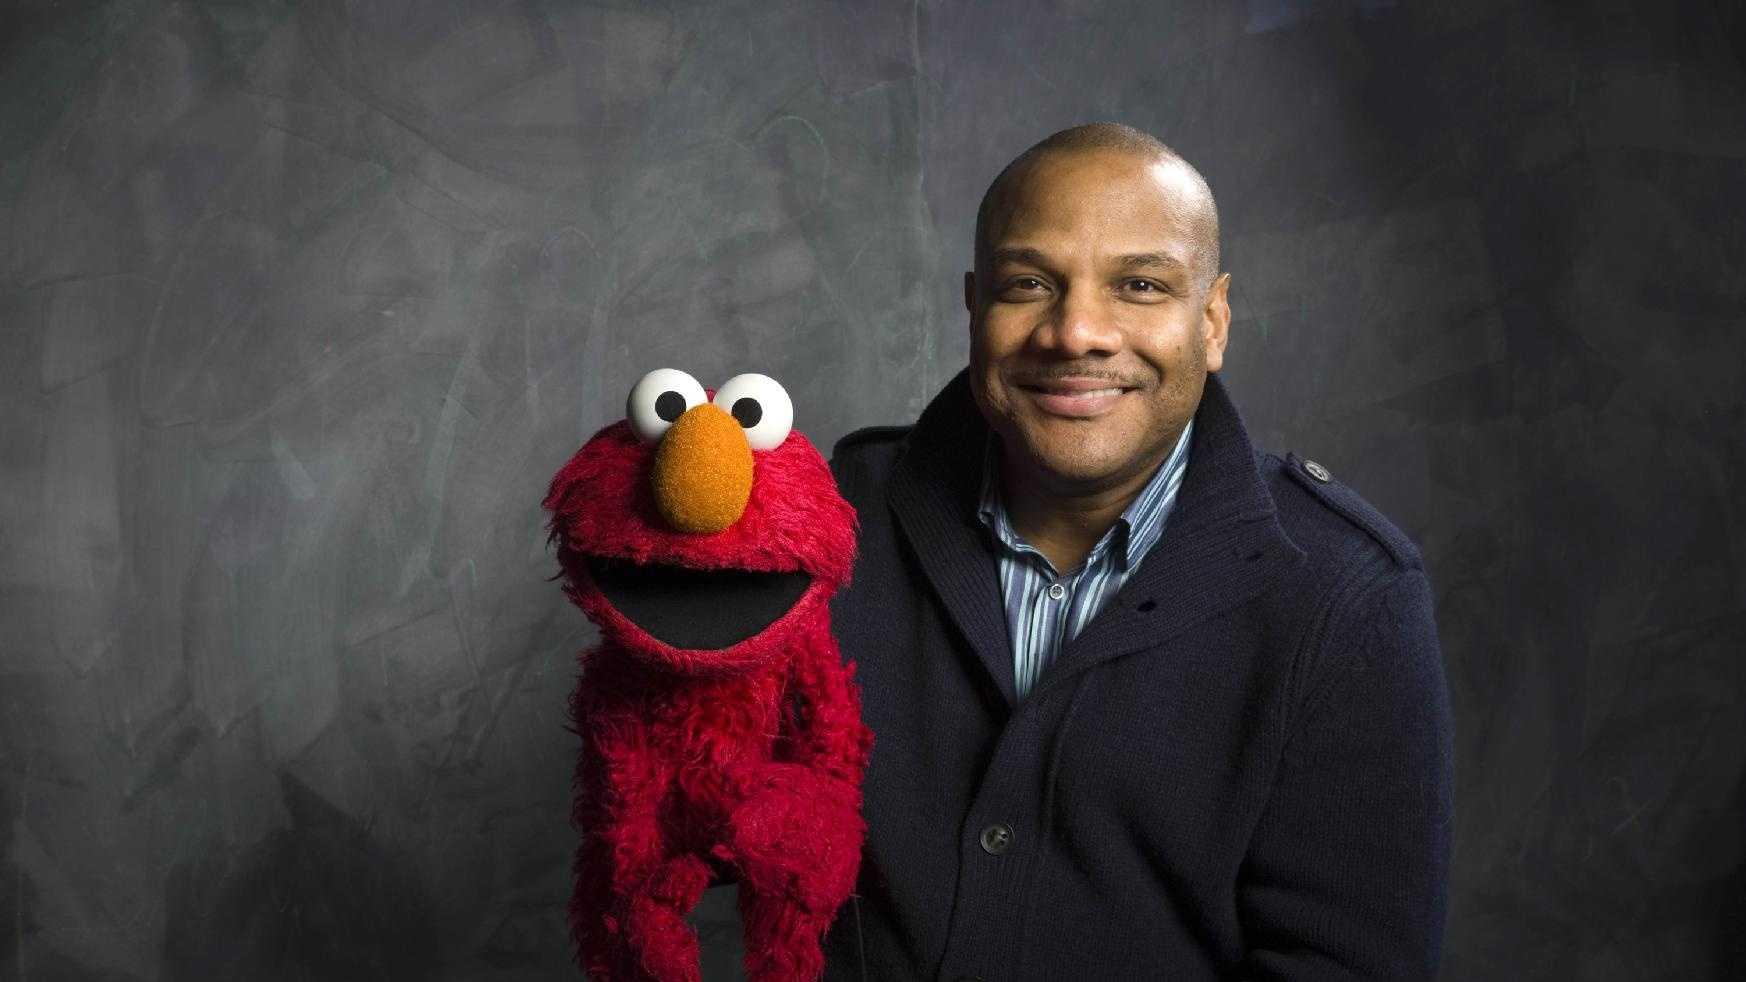 Elmo Puppeter